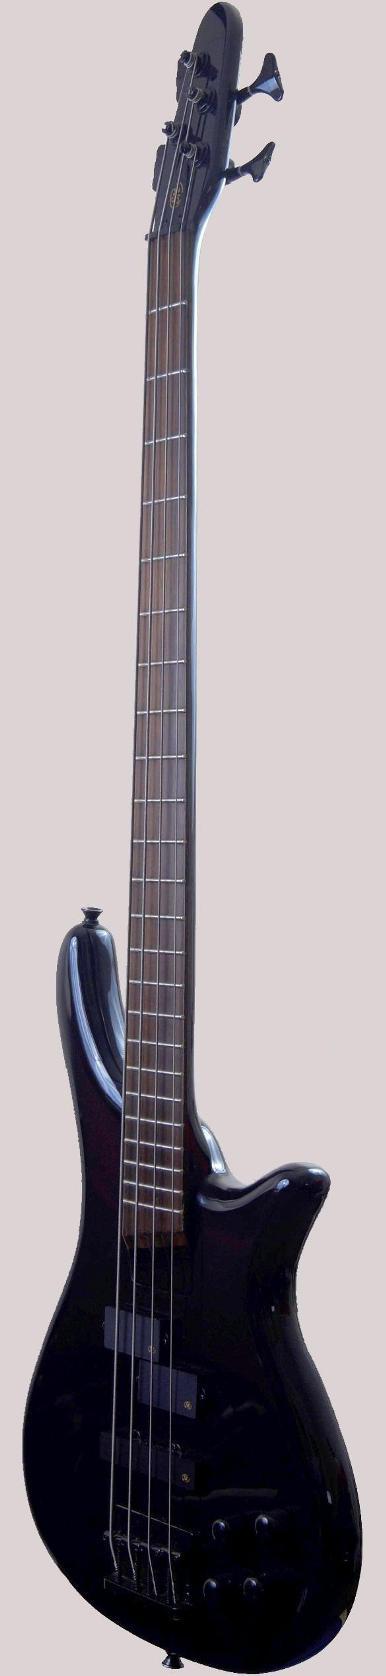 Chinese 4 string bass Guitar